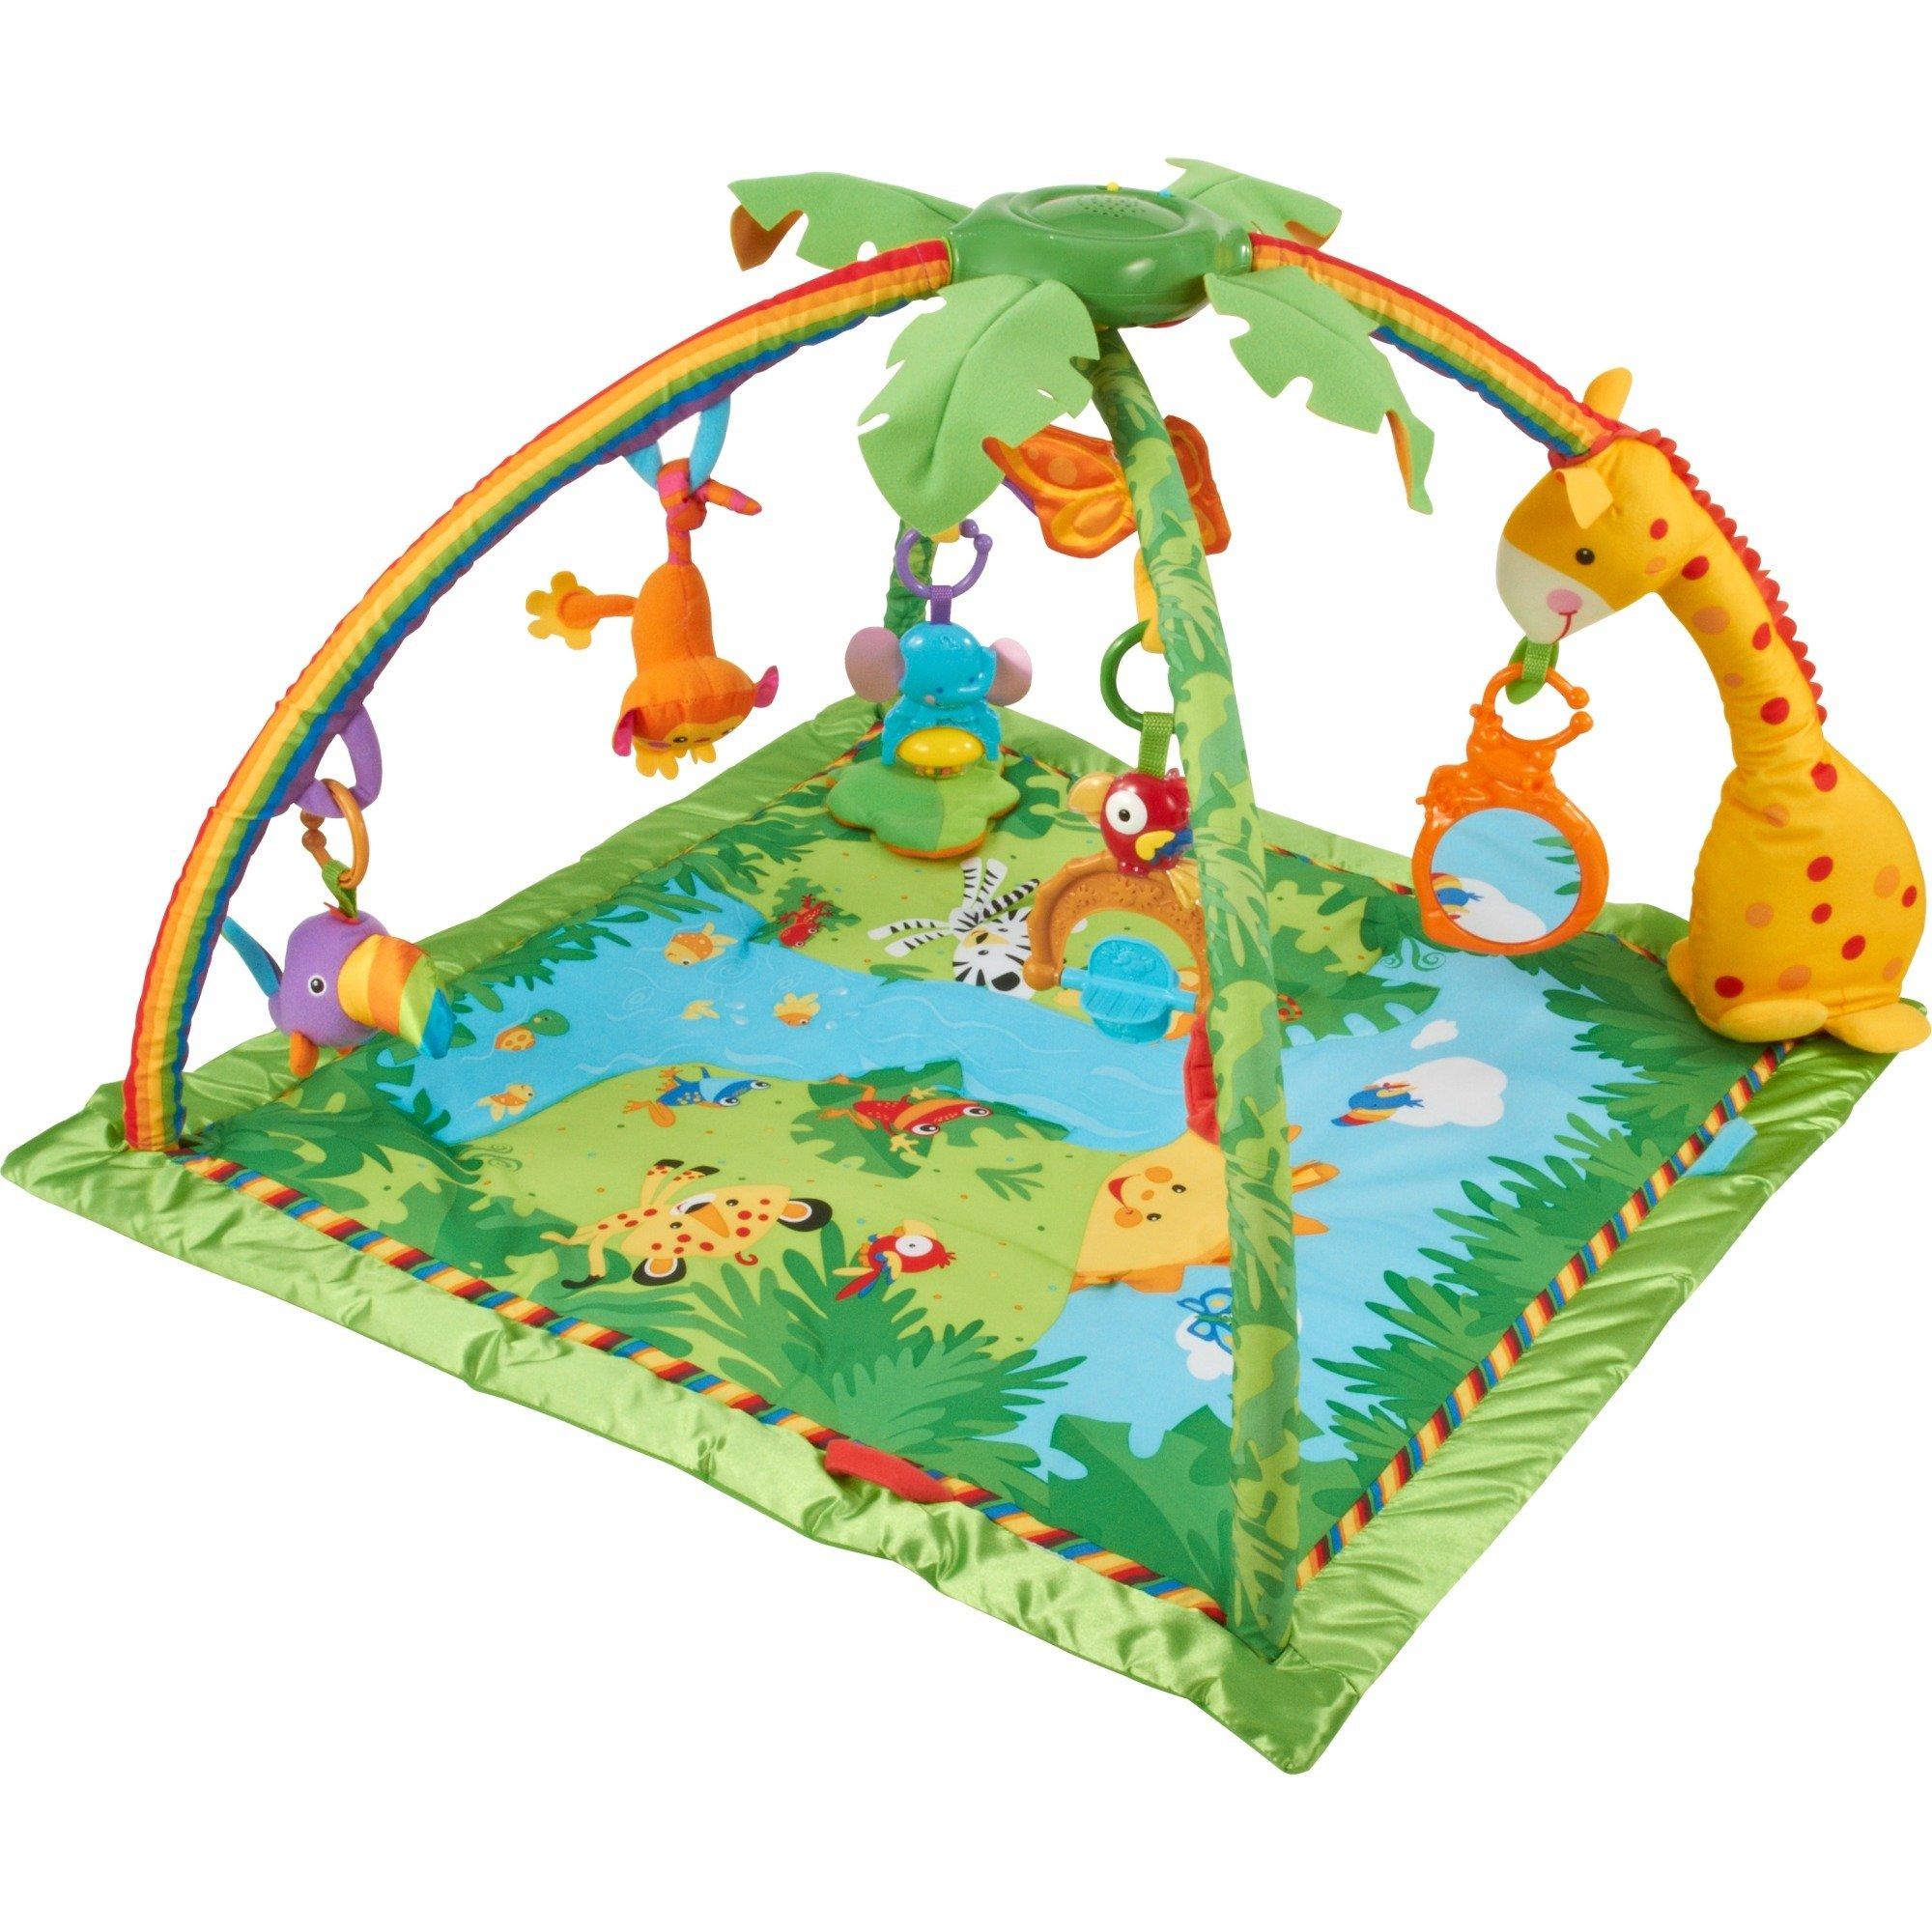 rainforest-discoverey-blanket-legetappe